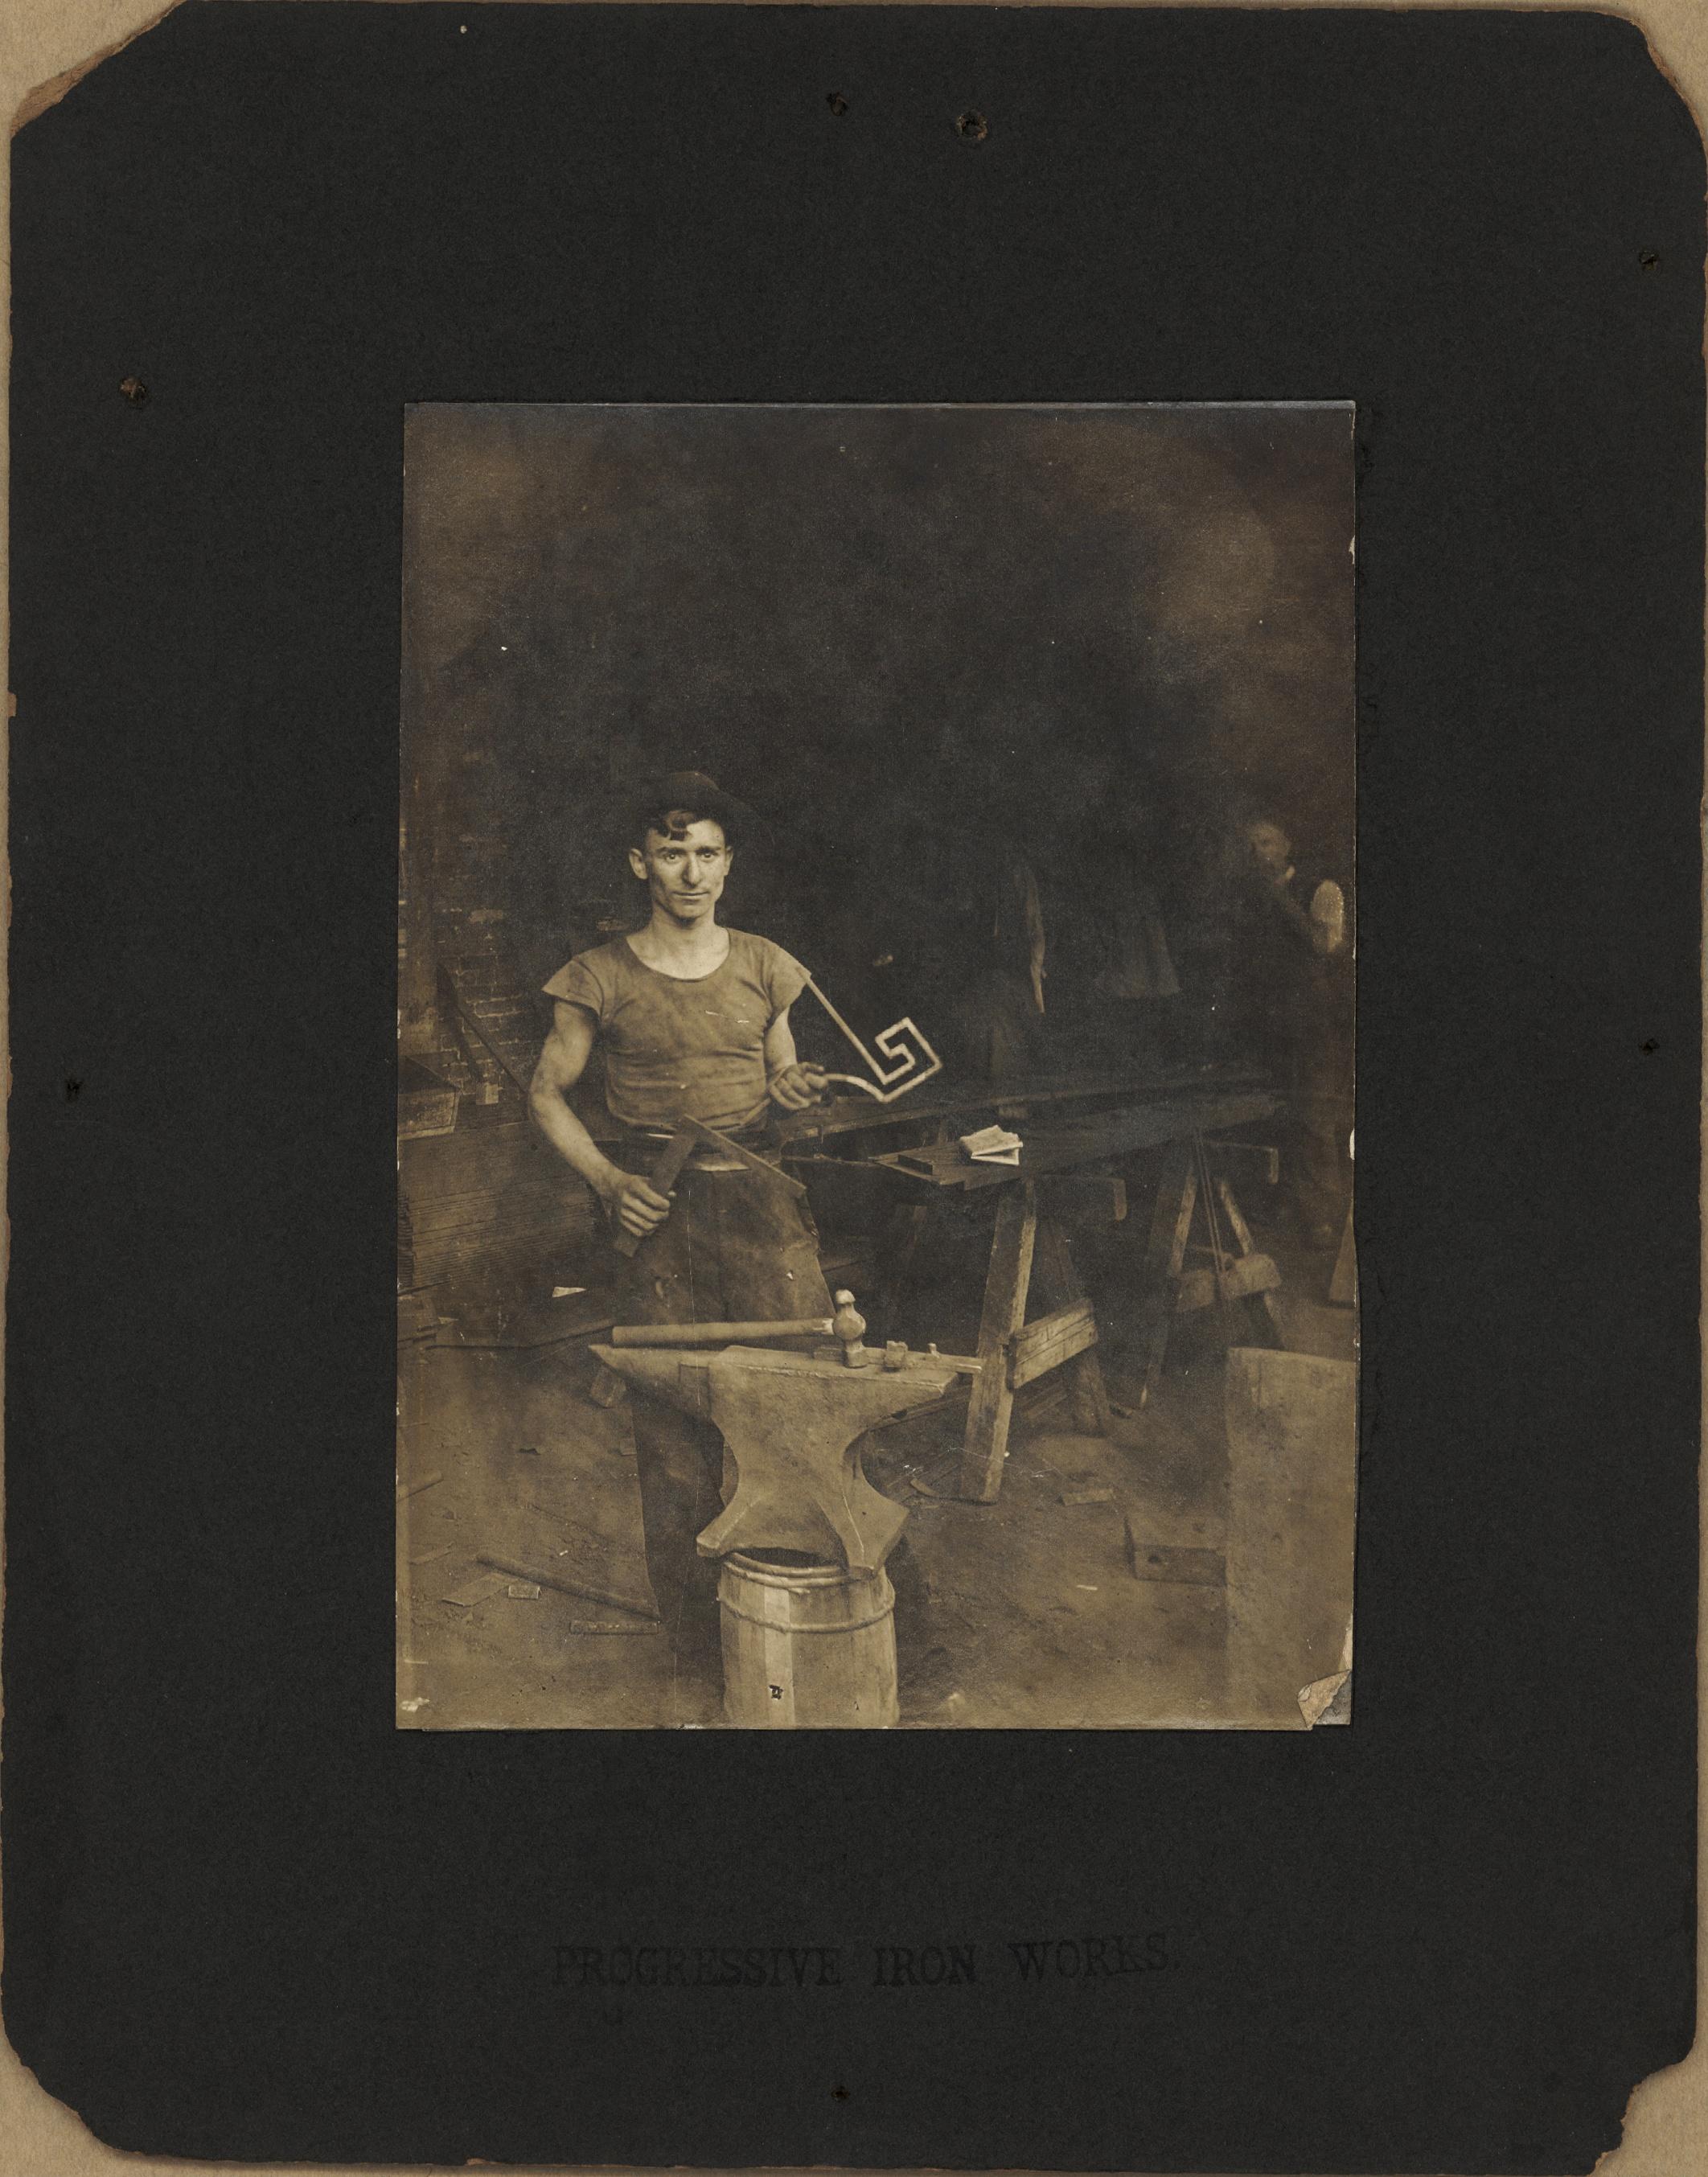 1910s New York  Joseph Acquiste, blacksmith at Progressive Iron Works.